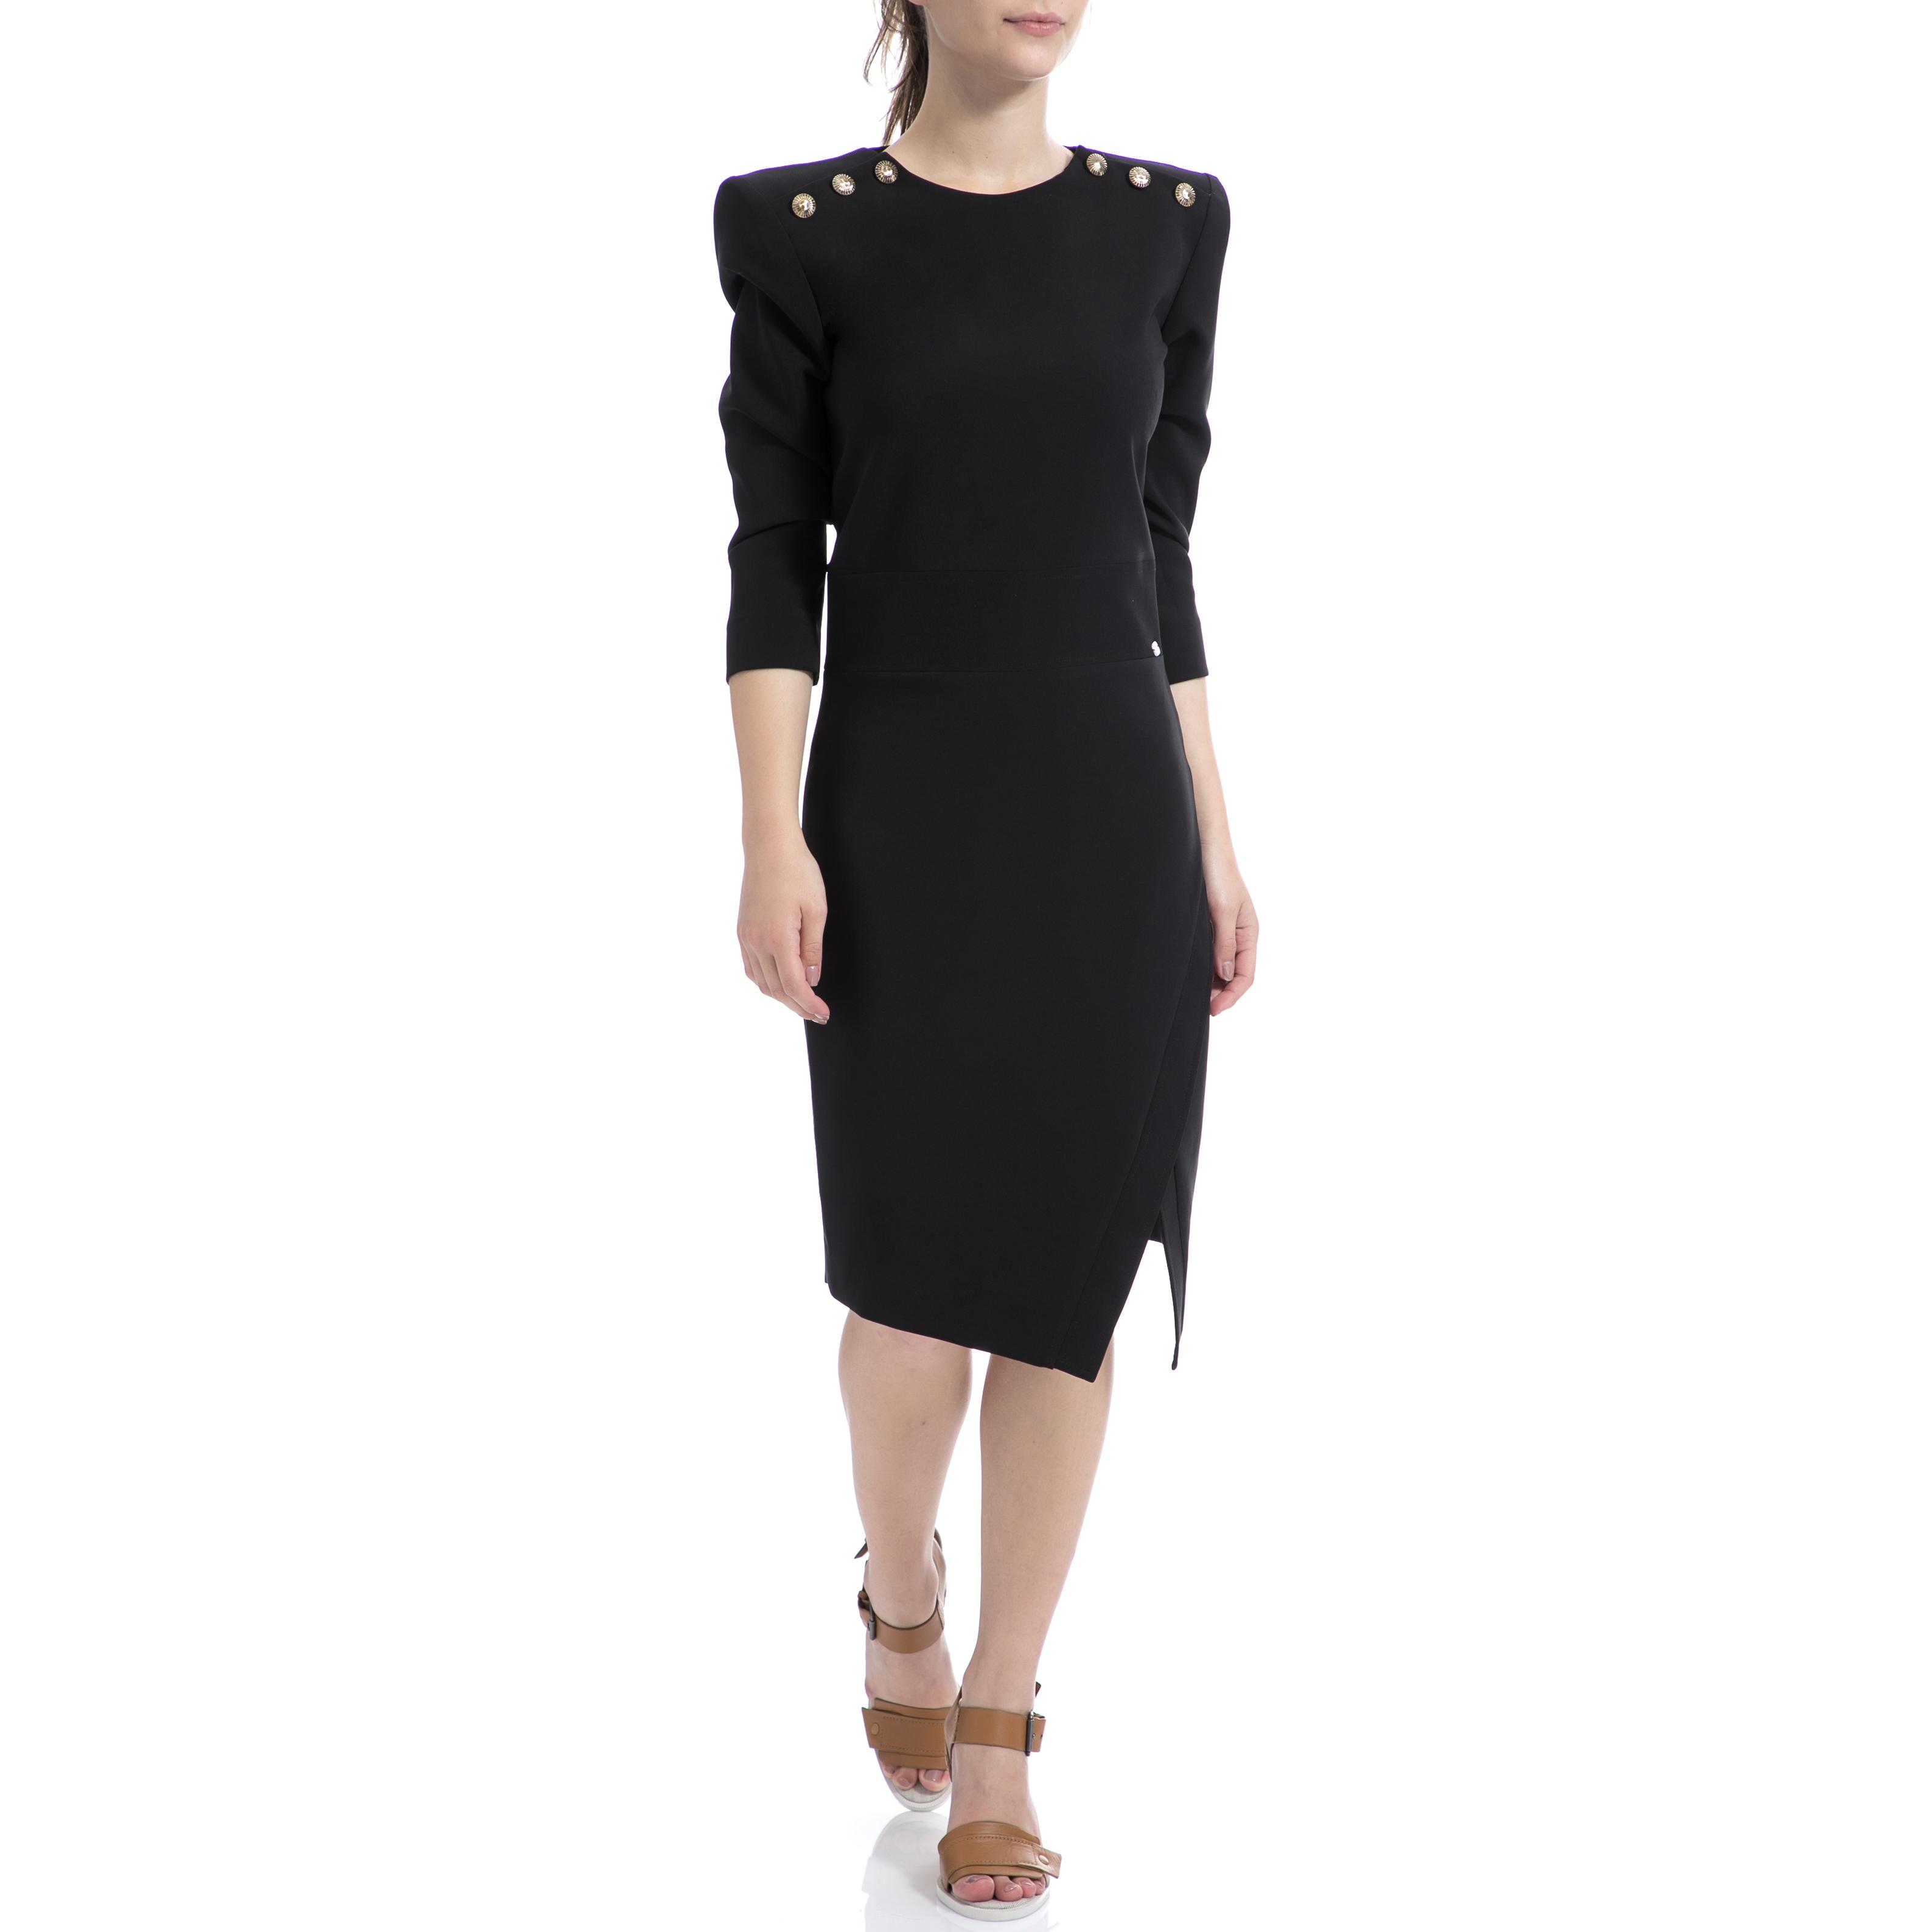 DENNY ROSE – Γυναικείο φόρεμα Denny Rose μαύρο